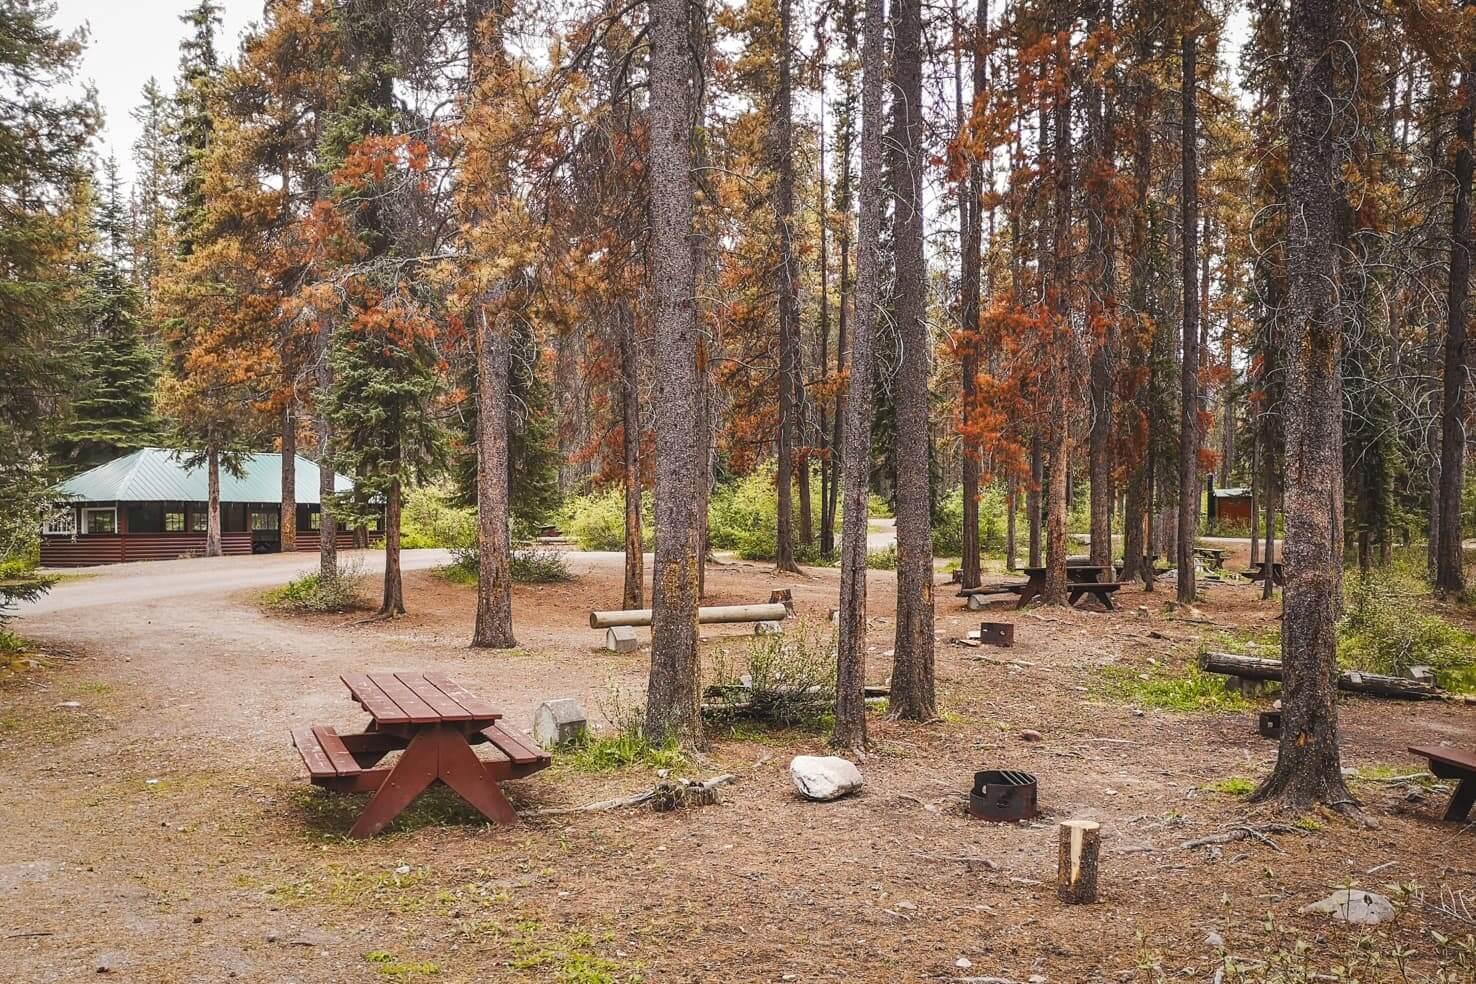 Camping in Jasper National Park - Honeymoon Lake Campground